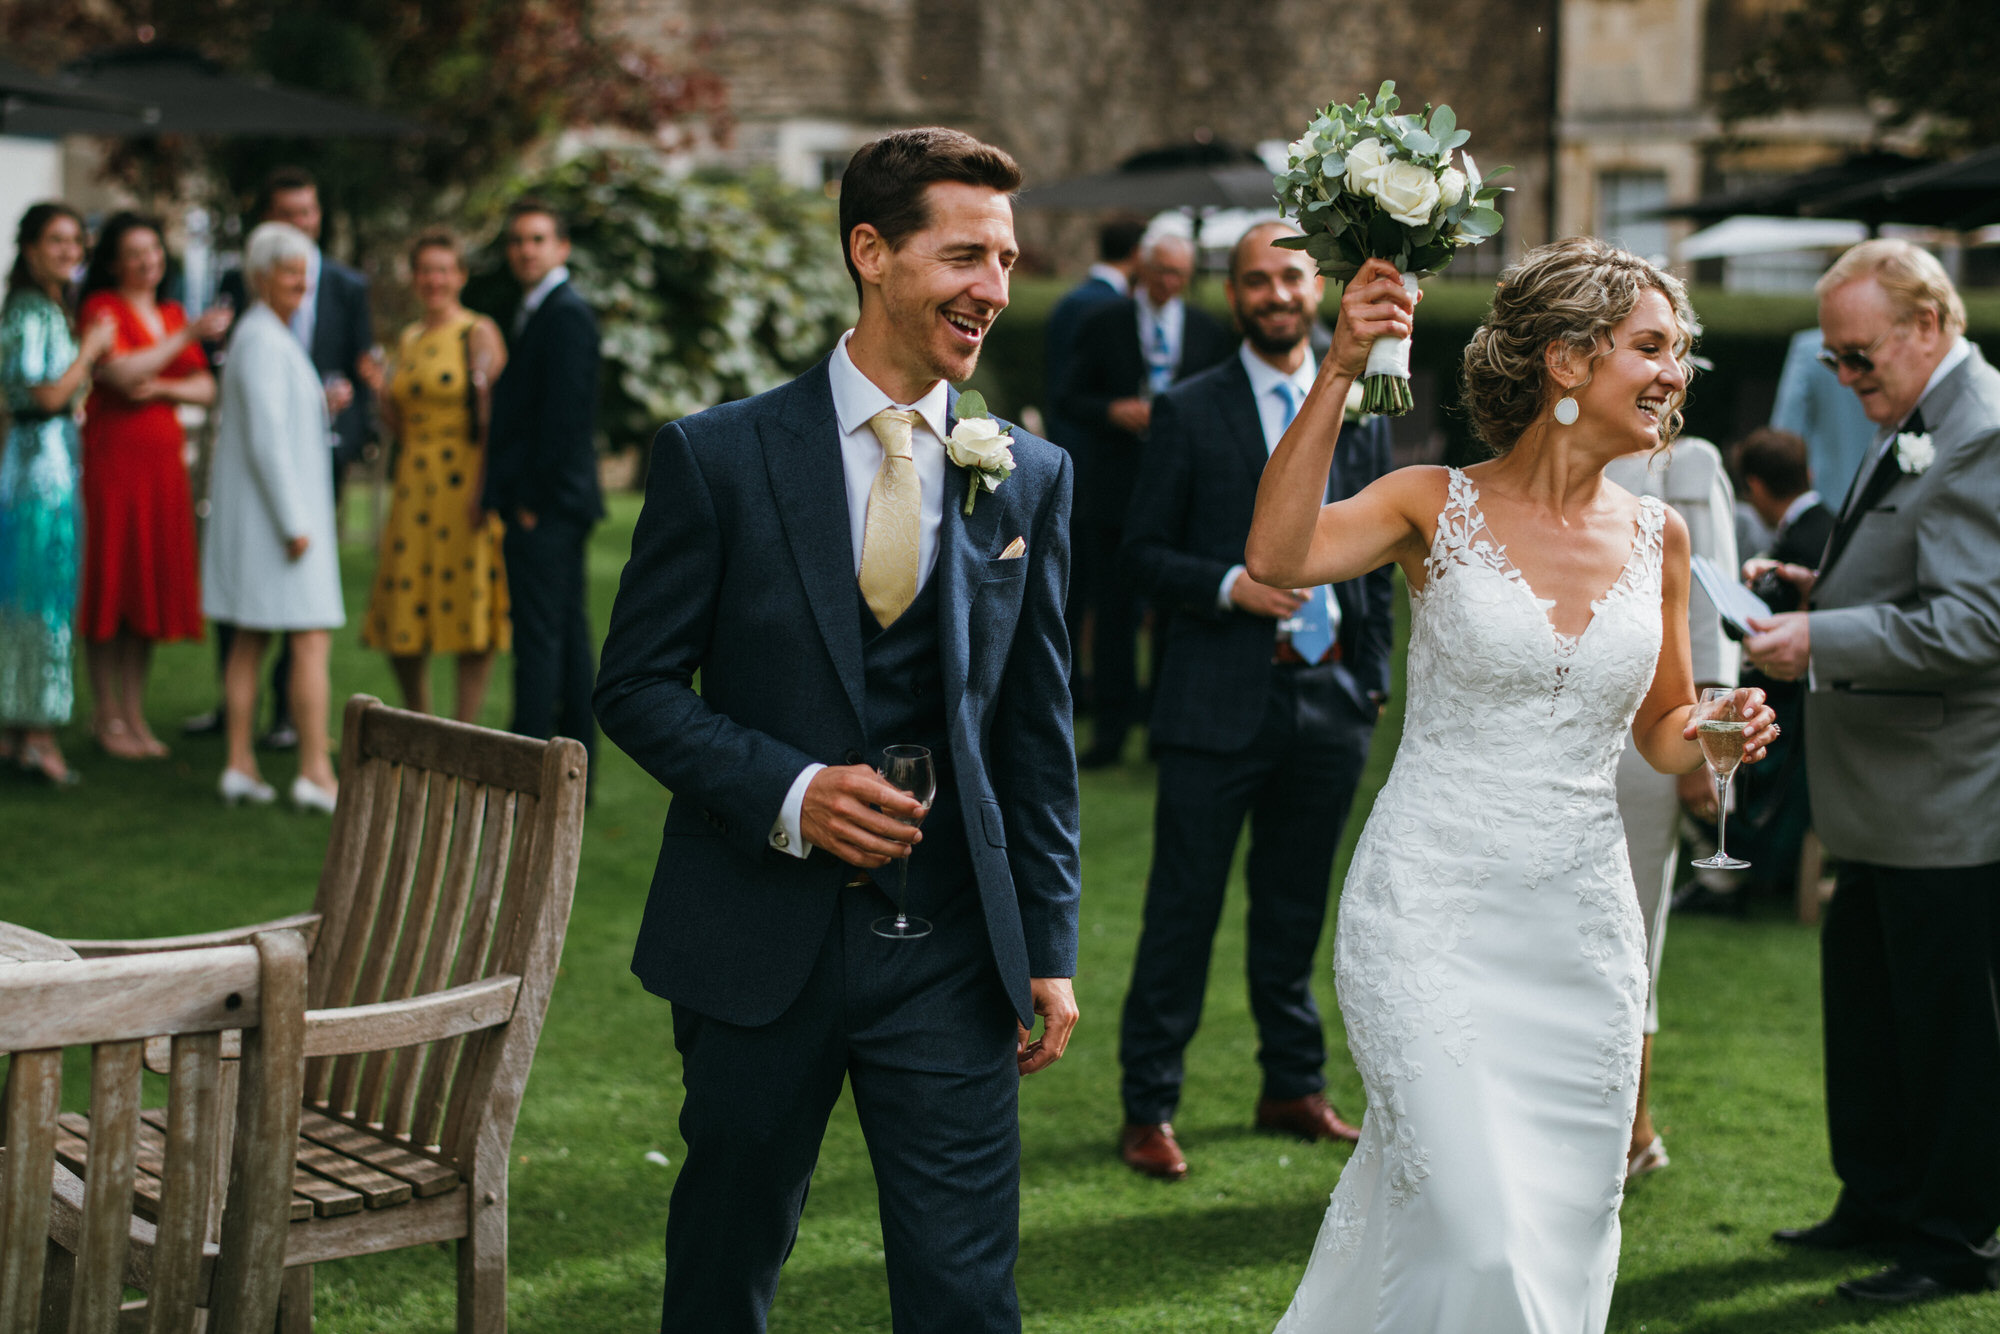 Royal crescent wedding couple